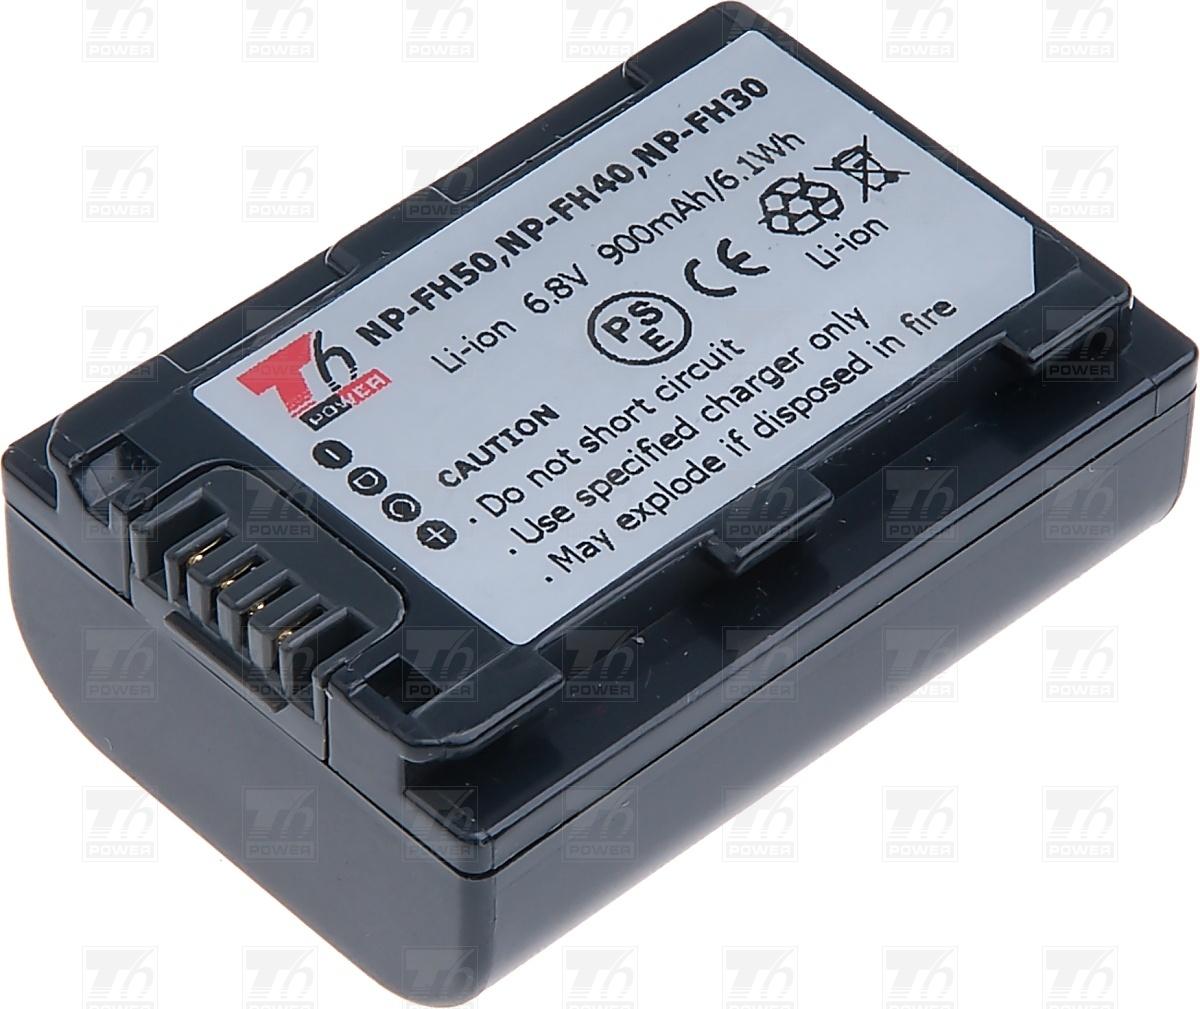 T6 power Baterie T6 power NP-FH30, NP-FH40, NP-FH50 VCSO0050